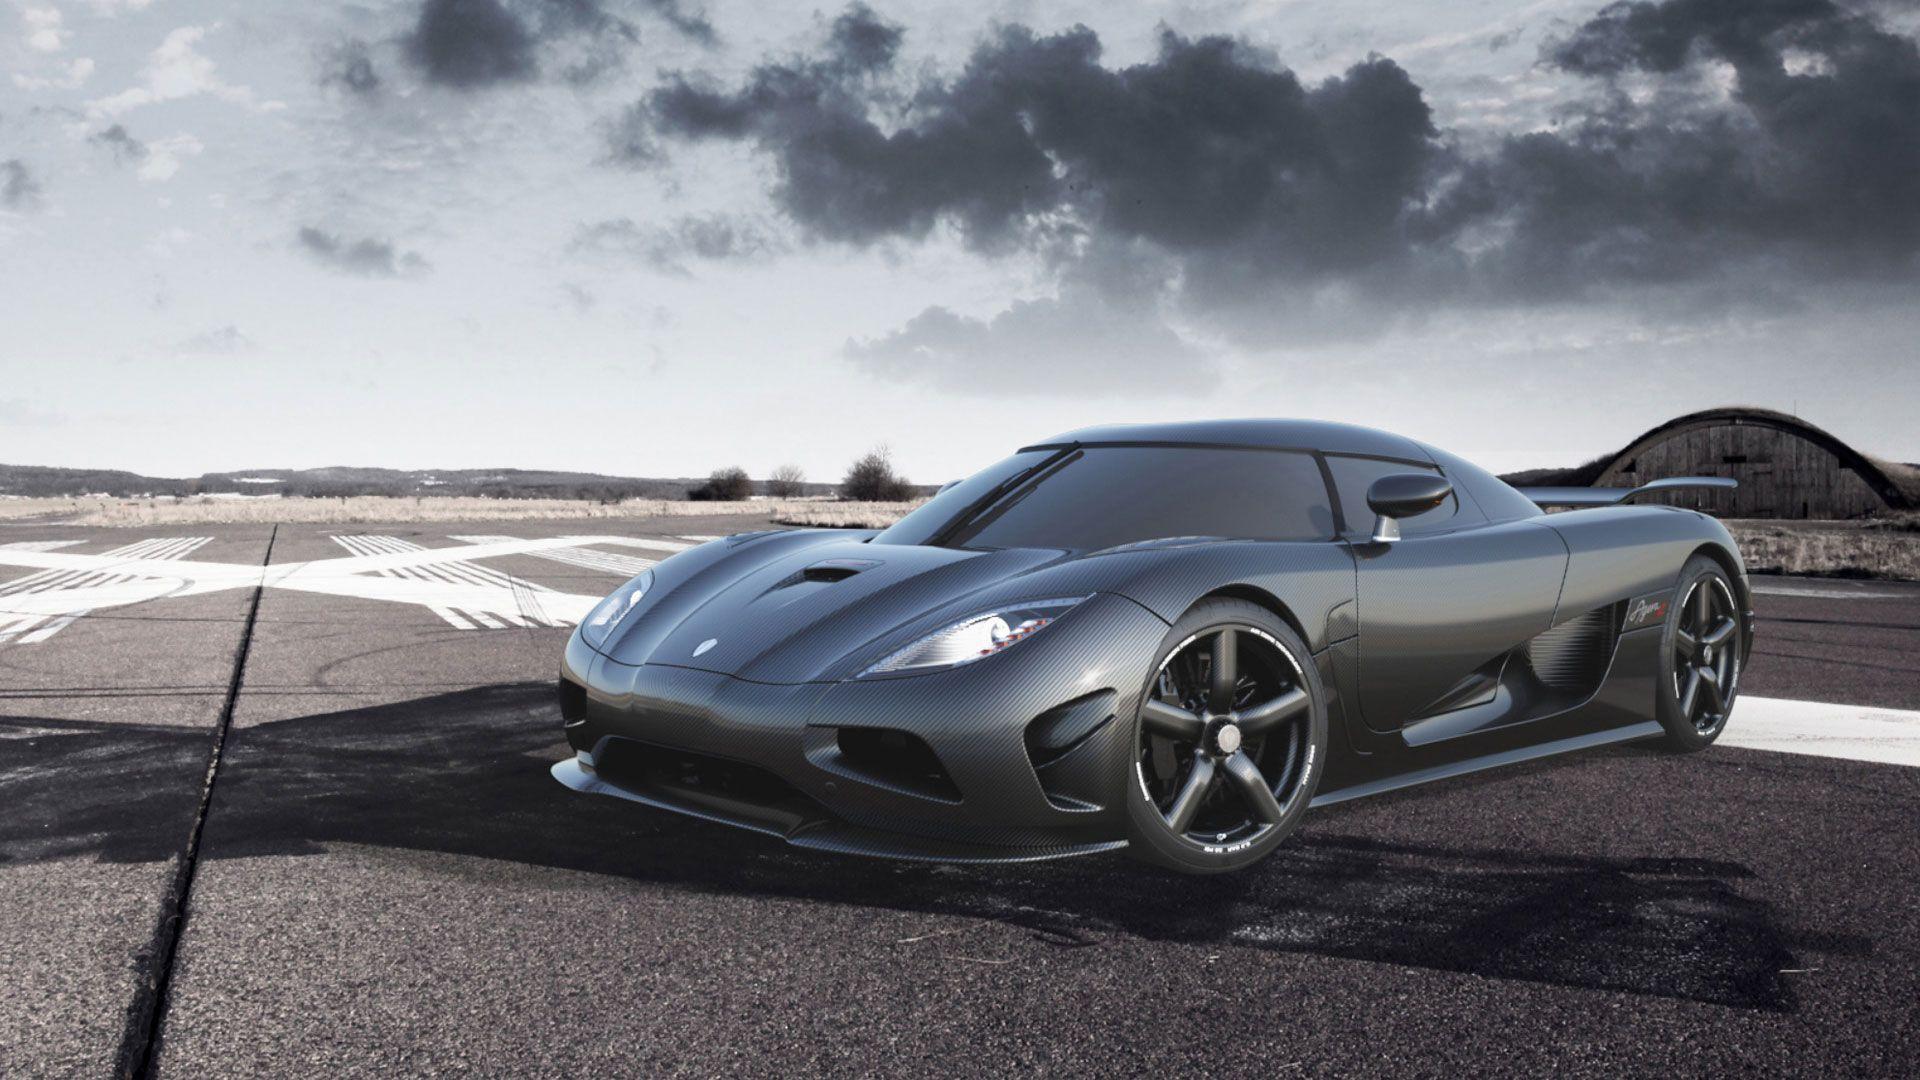 Koenigsegg ccxr trevita hd wallpapers download koenigsegg d k art